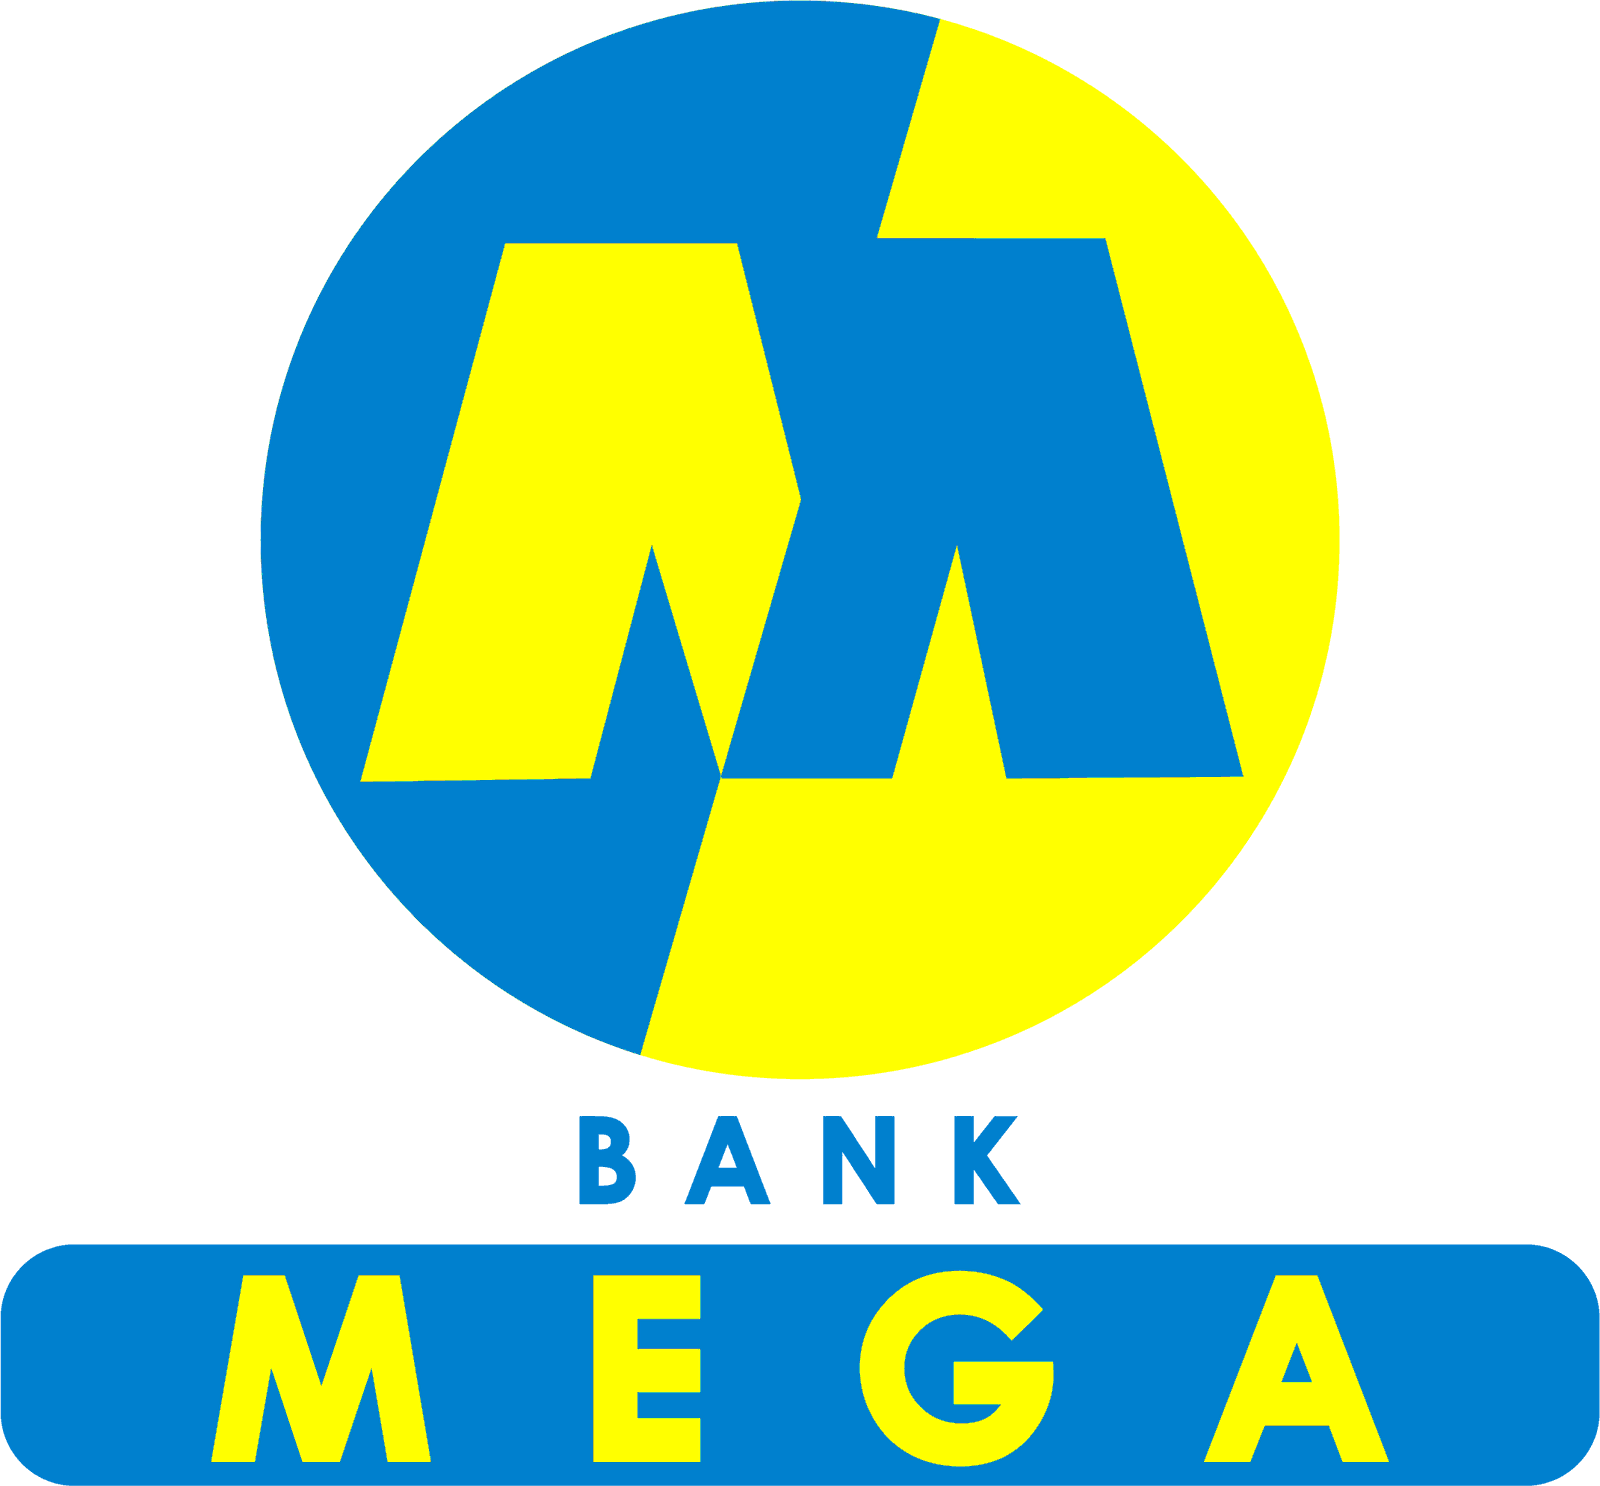 Lowongan Kerja Bank Mega Jakarta Juli 2014 (Dengan gambar